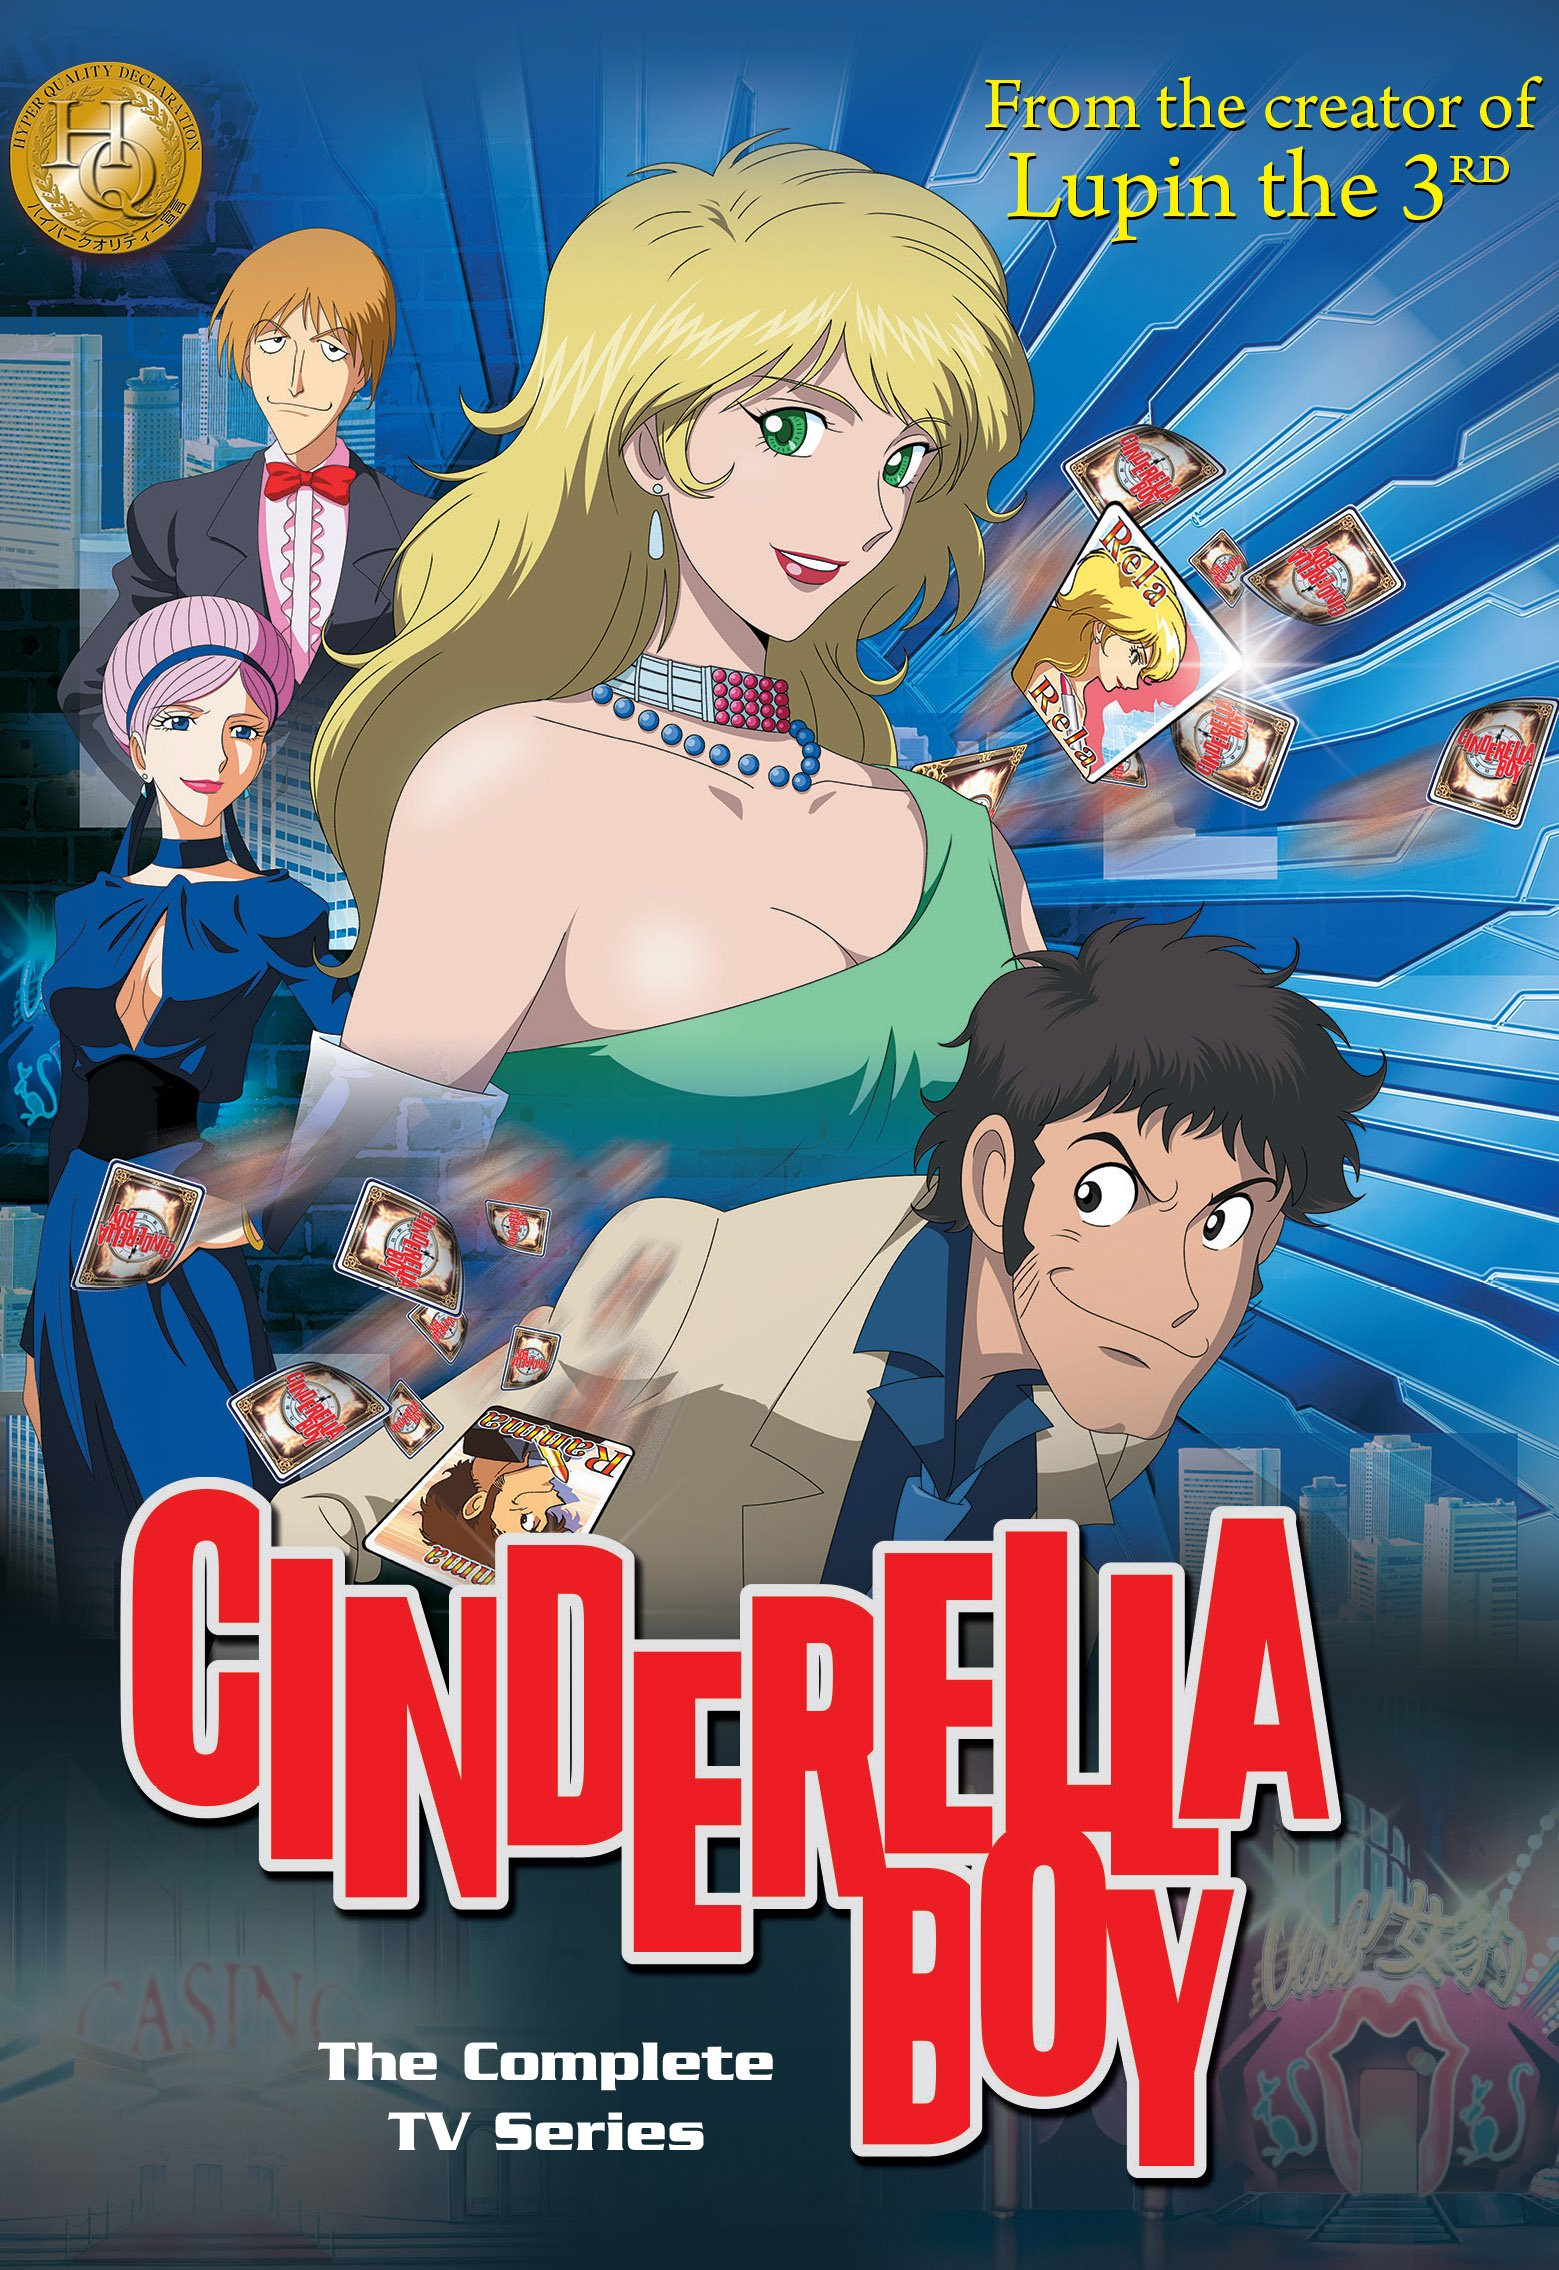 Cinderella Boy Complete Tv Ser